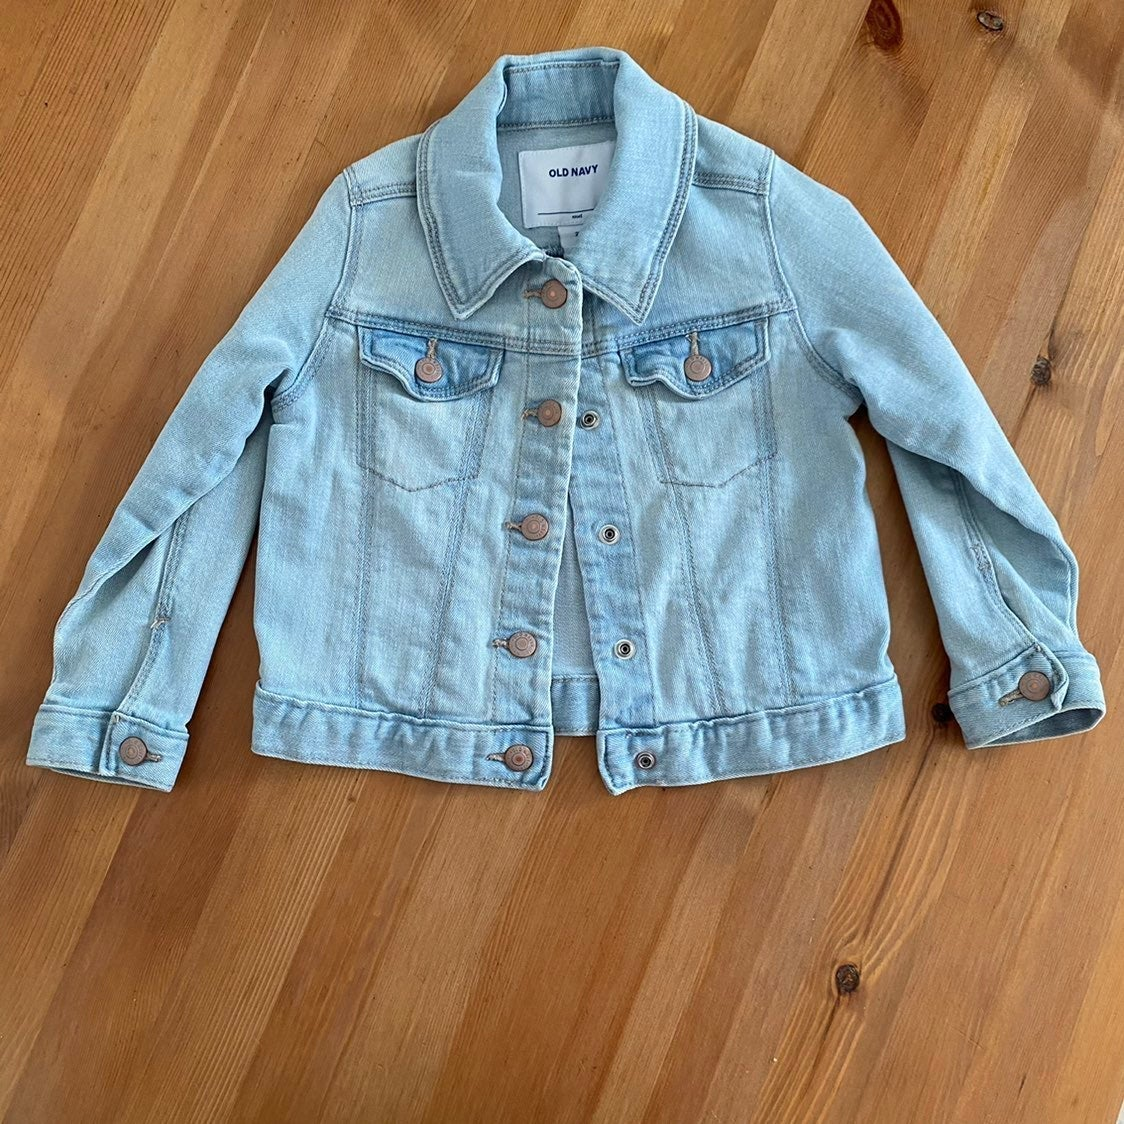 OLD NAVY Sz 2T Bleached Denim Jacket